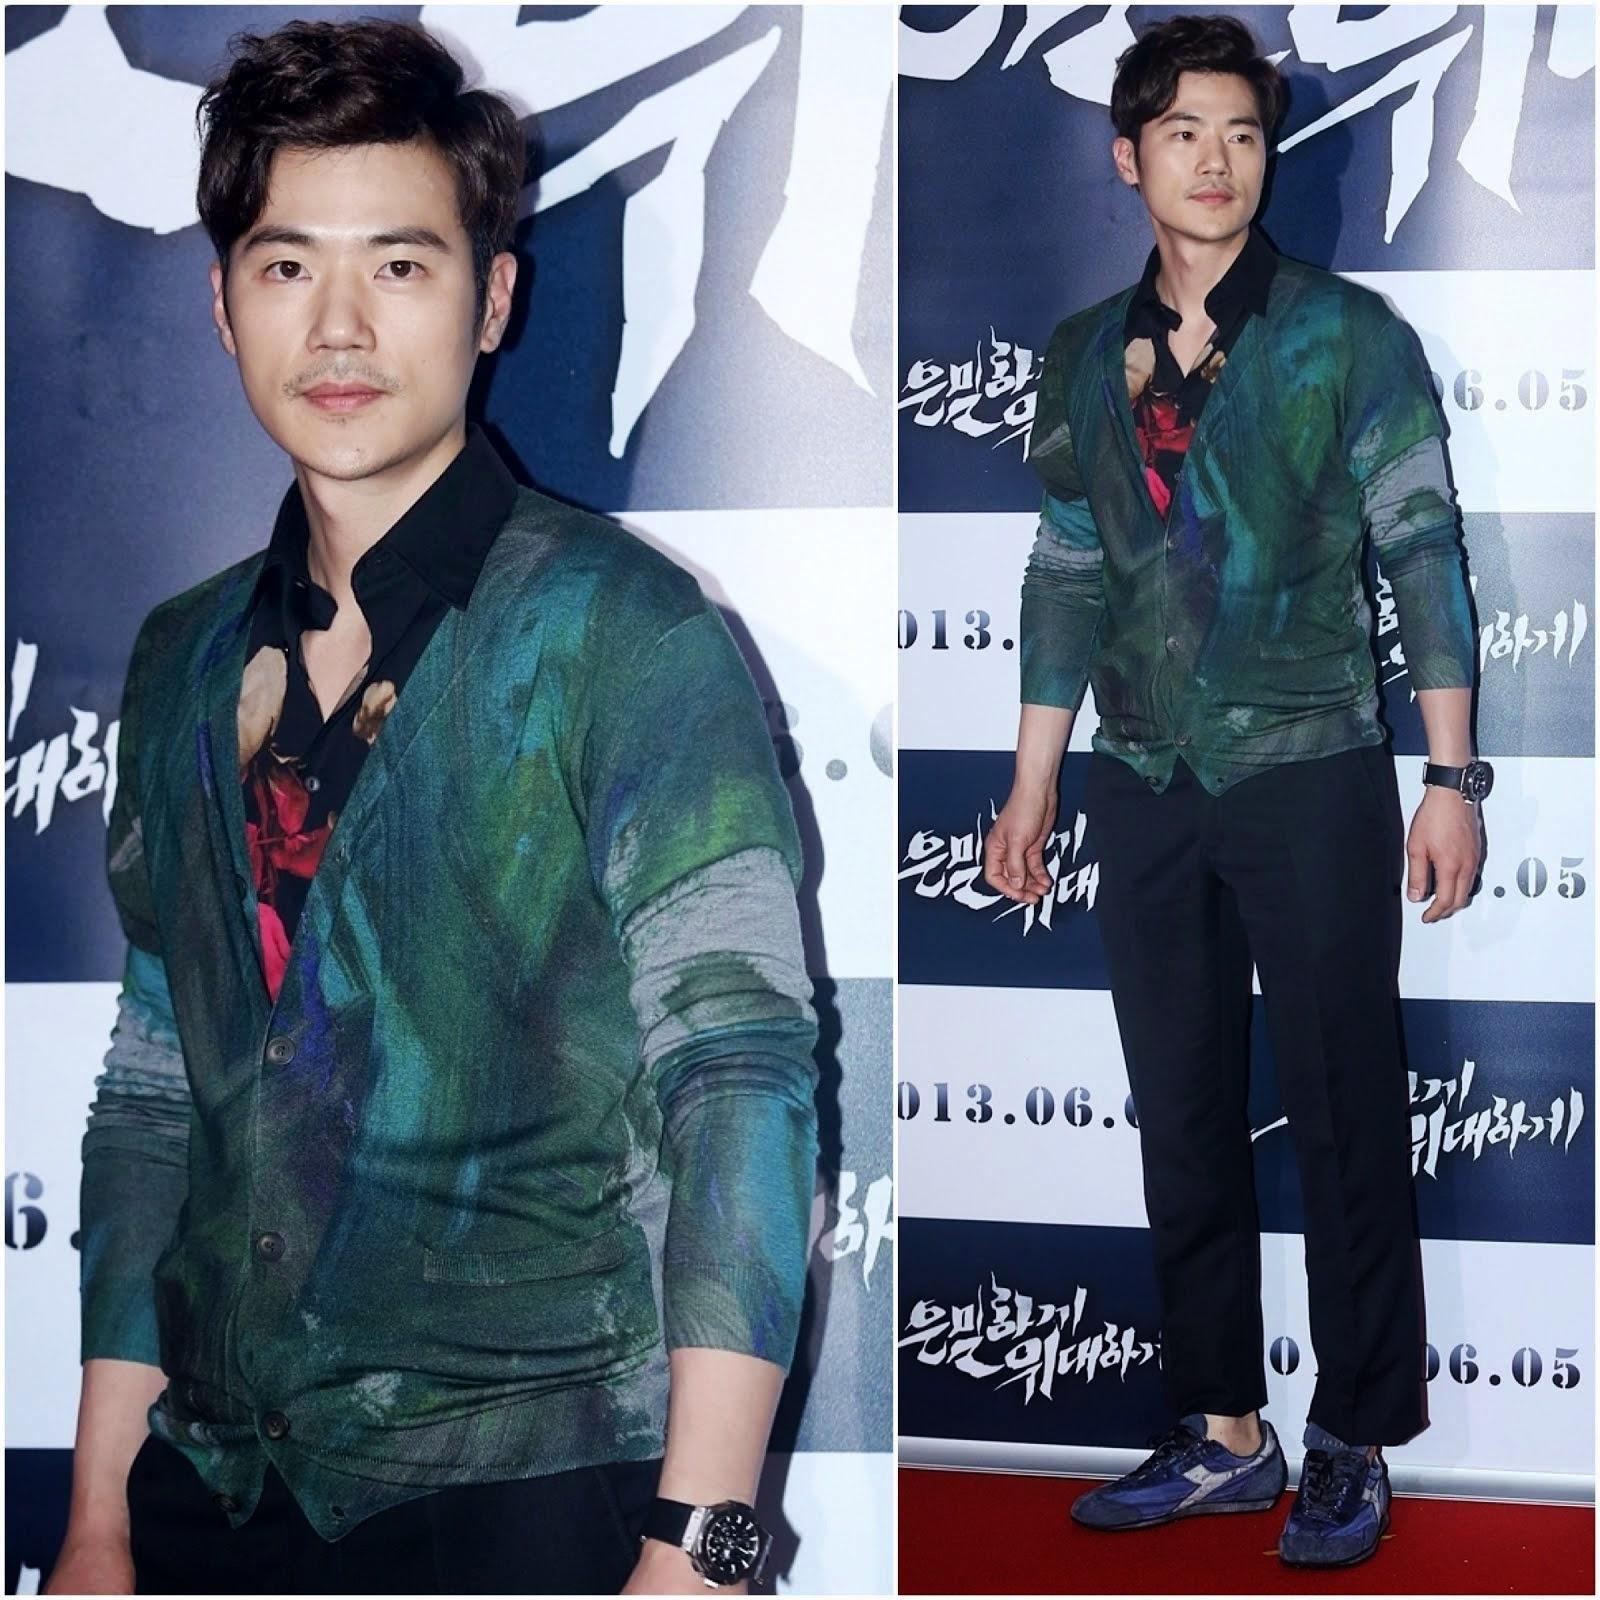 00O00 Menswear Blog: Kim Kang-Woo in Christopher Kane - 金强宇出席韩国电影《隐秘而伟大》媒体首映式